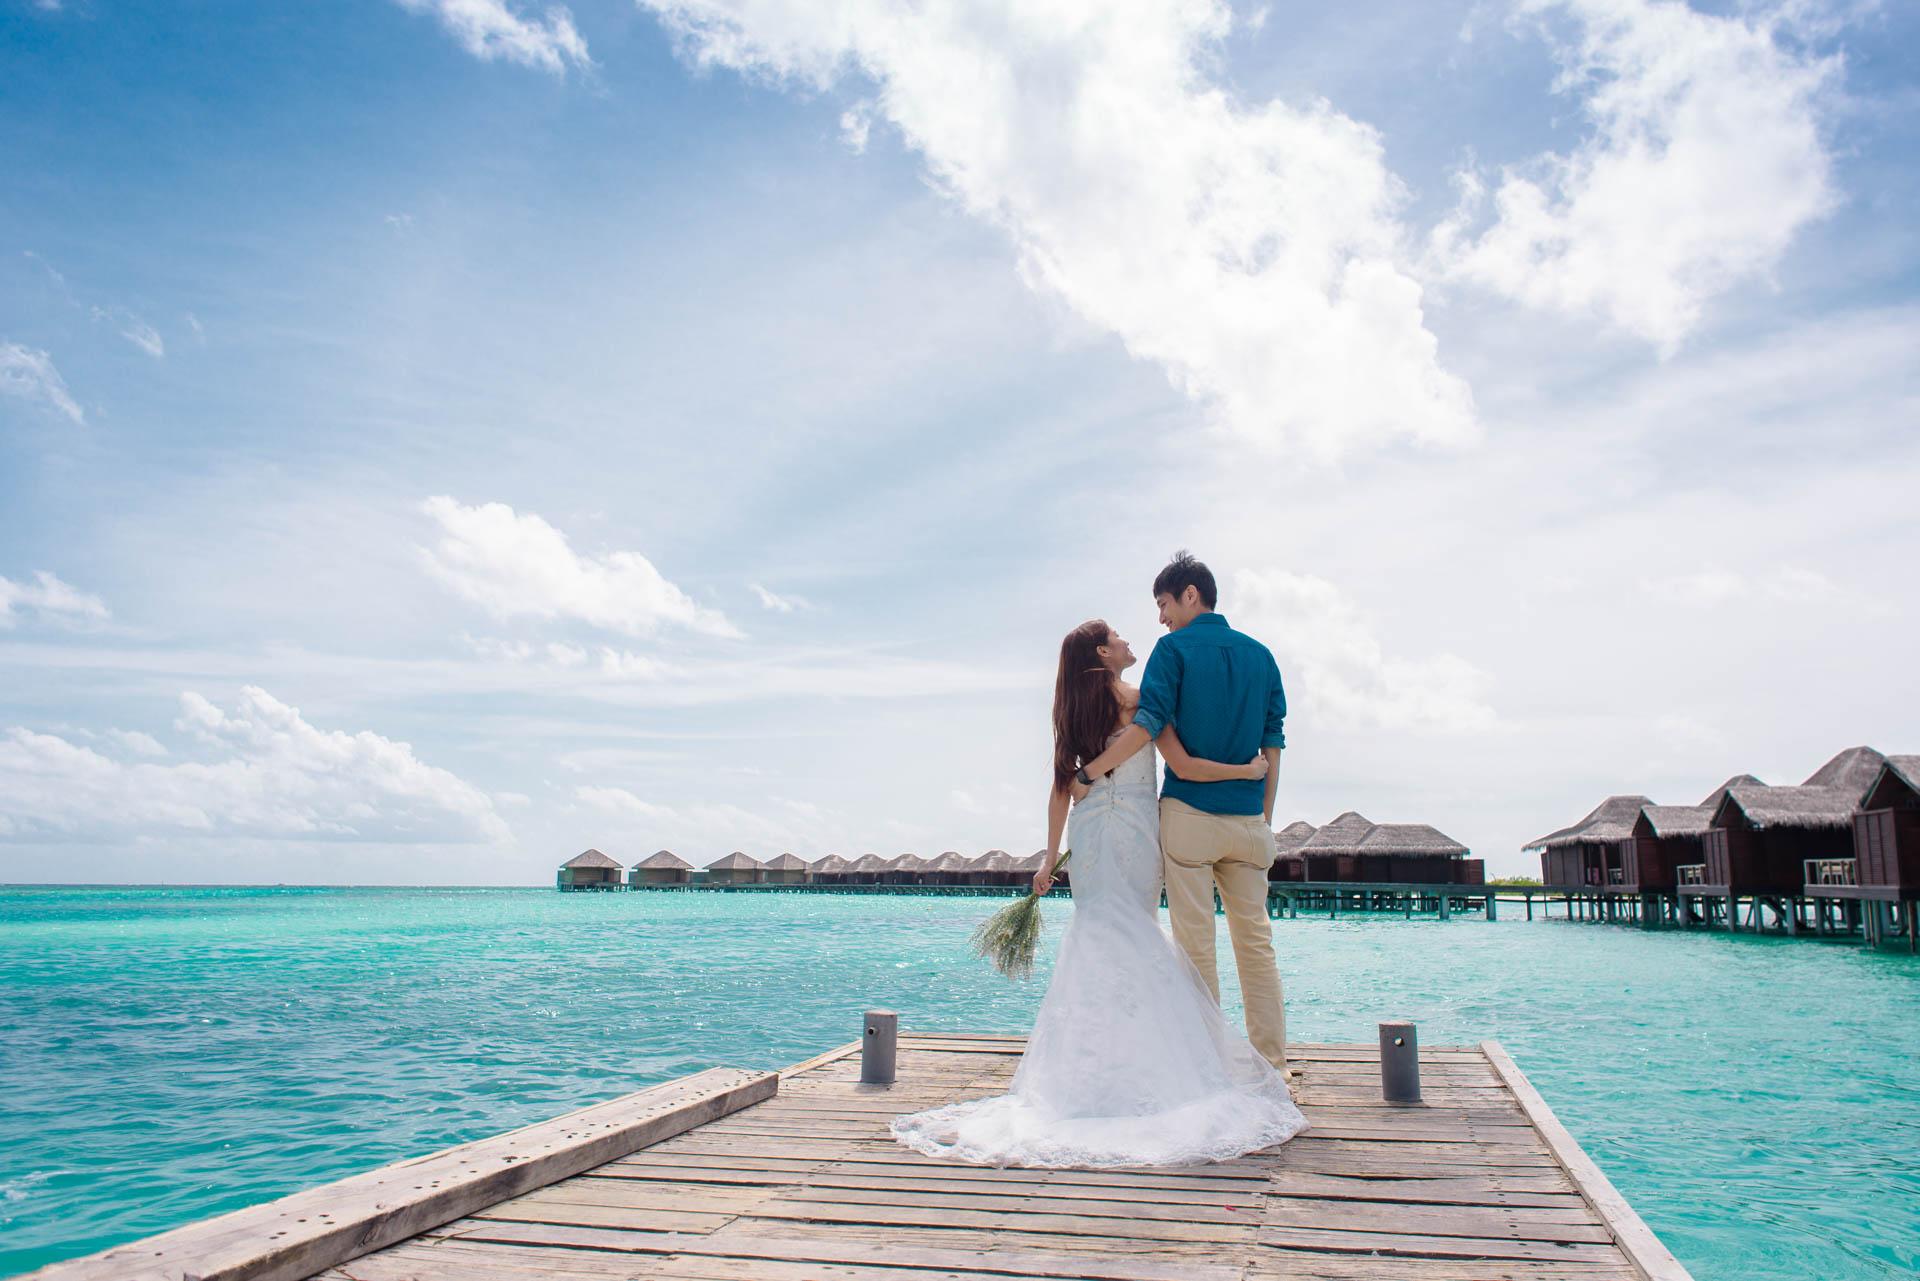 Charmy and Samson Honeymoon Photoshoot at Anantara Dhigu Veli and Naladhu Resort in Maldives by Asads Photography 2